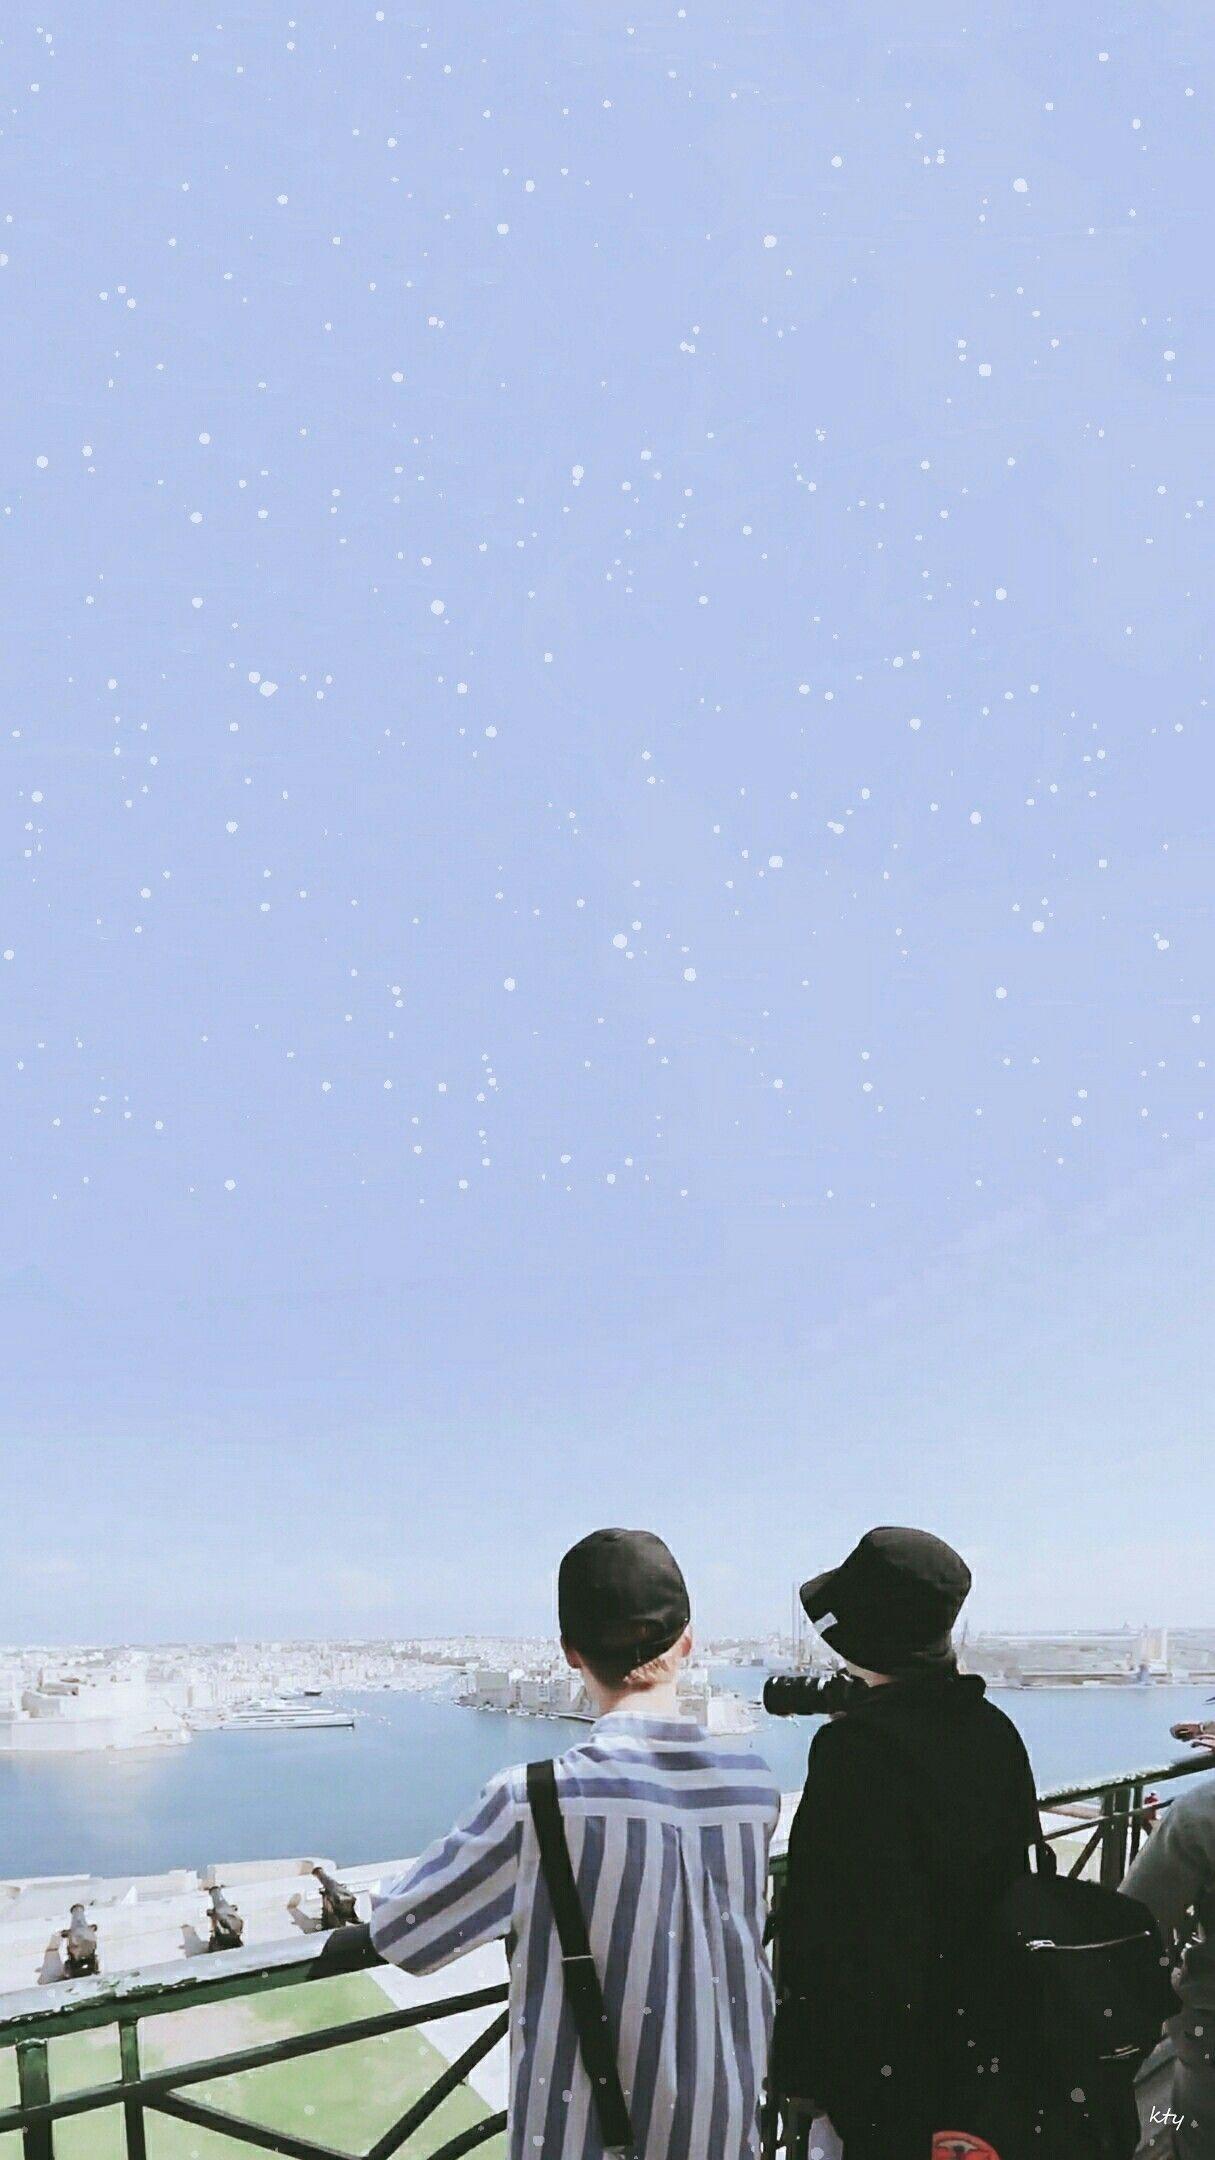 Bts Edits Bts Wallpapers Bon Voyage Season 3 In Malta Pls Make Sure To Follow Me Before U Save It Find More On Park Jimin Cute Bts Jimin Bts Wallpaper Bts bon voyage wallpaper tumblr